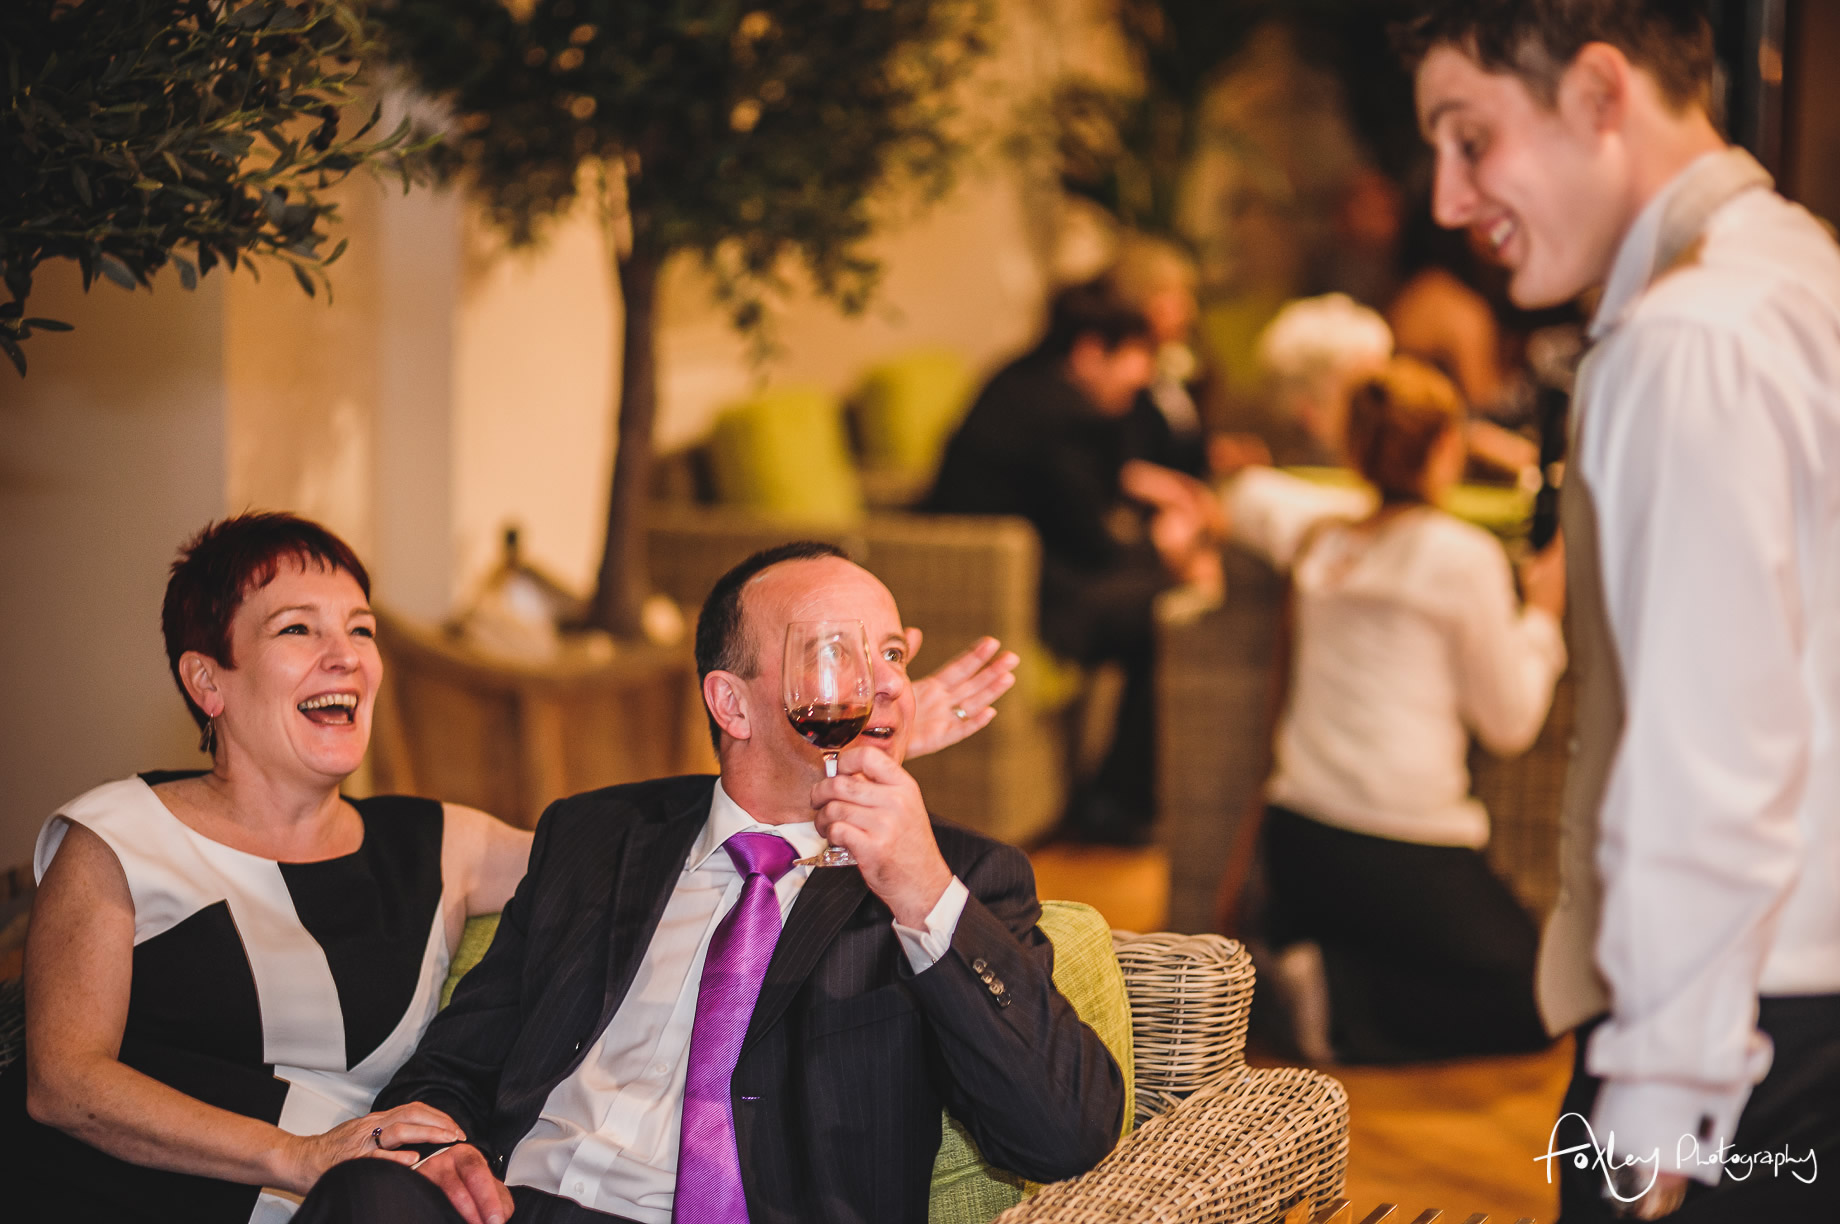 Gemma and Lewis' Wedding at Mitton Hall 142